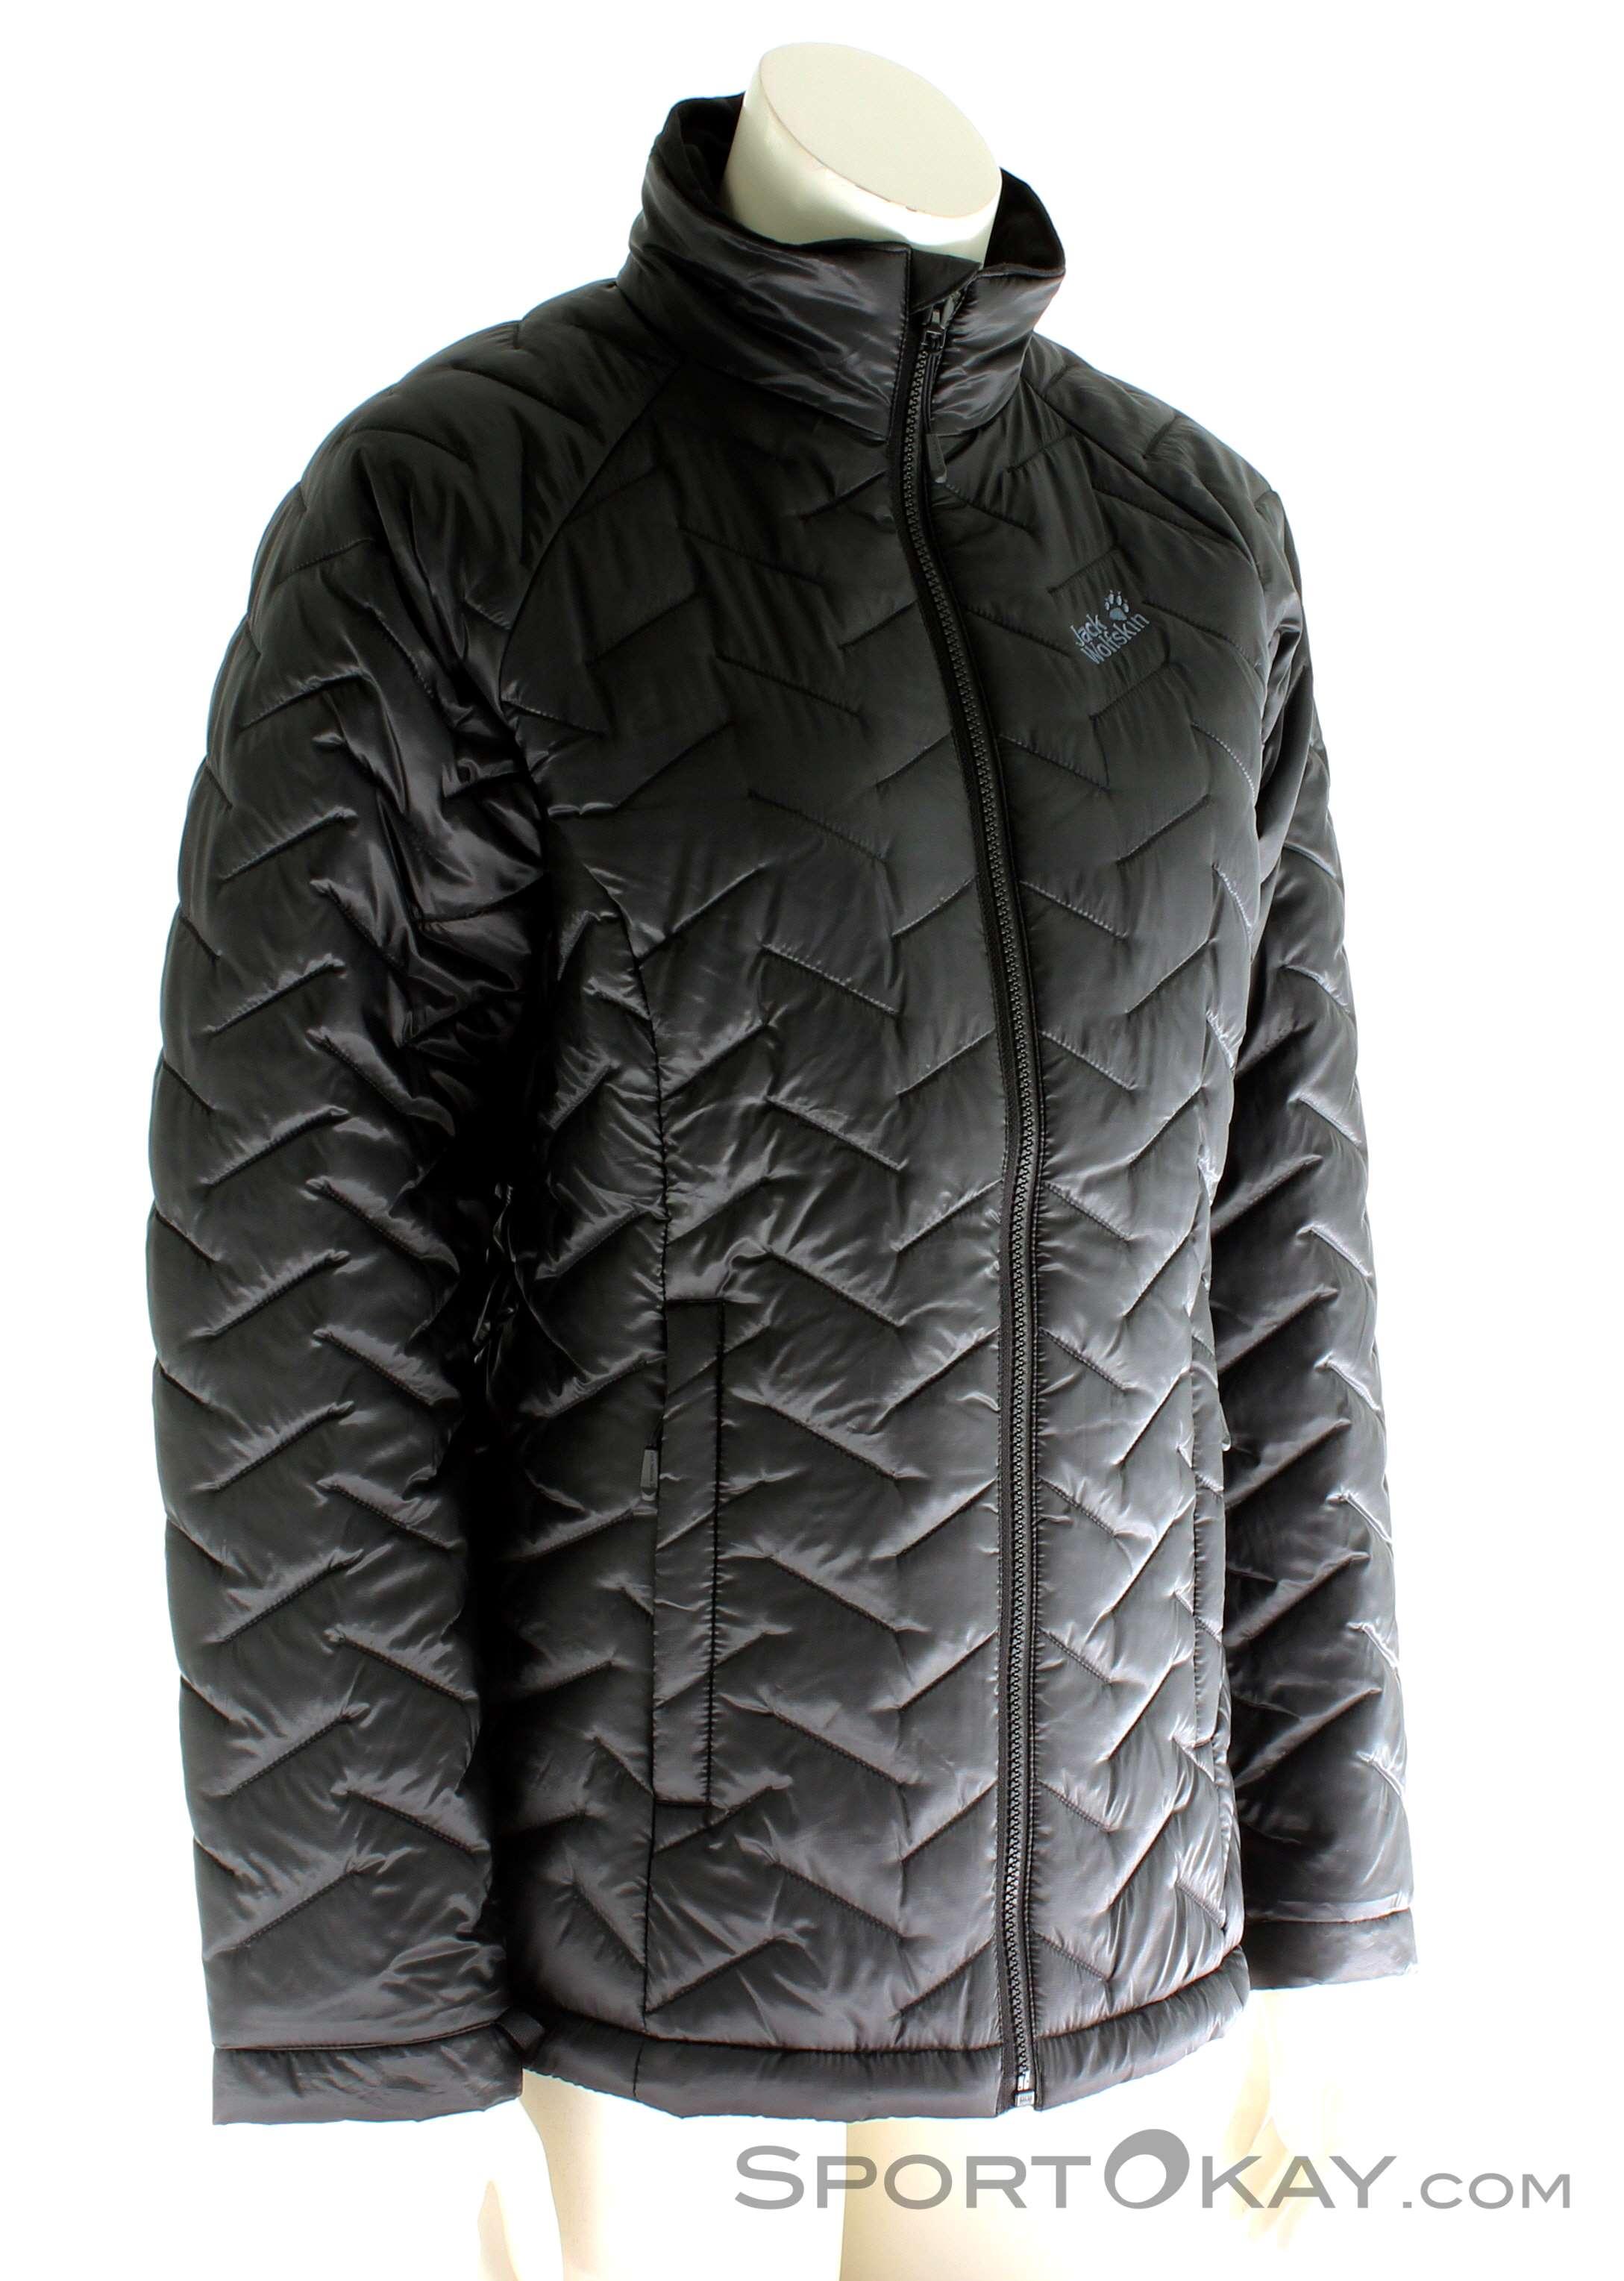 Jack Wolfskin Womens Icy Jacket Outdoor Creek n0kwPO